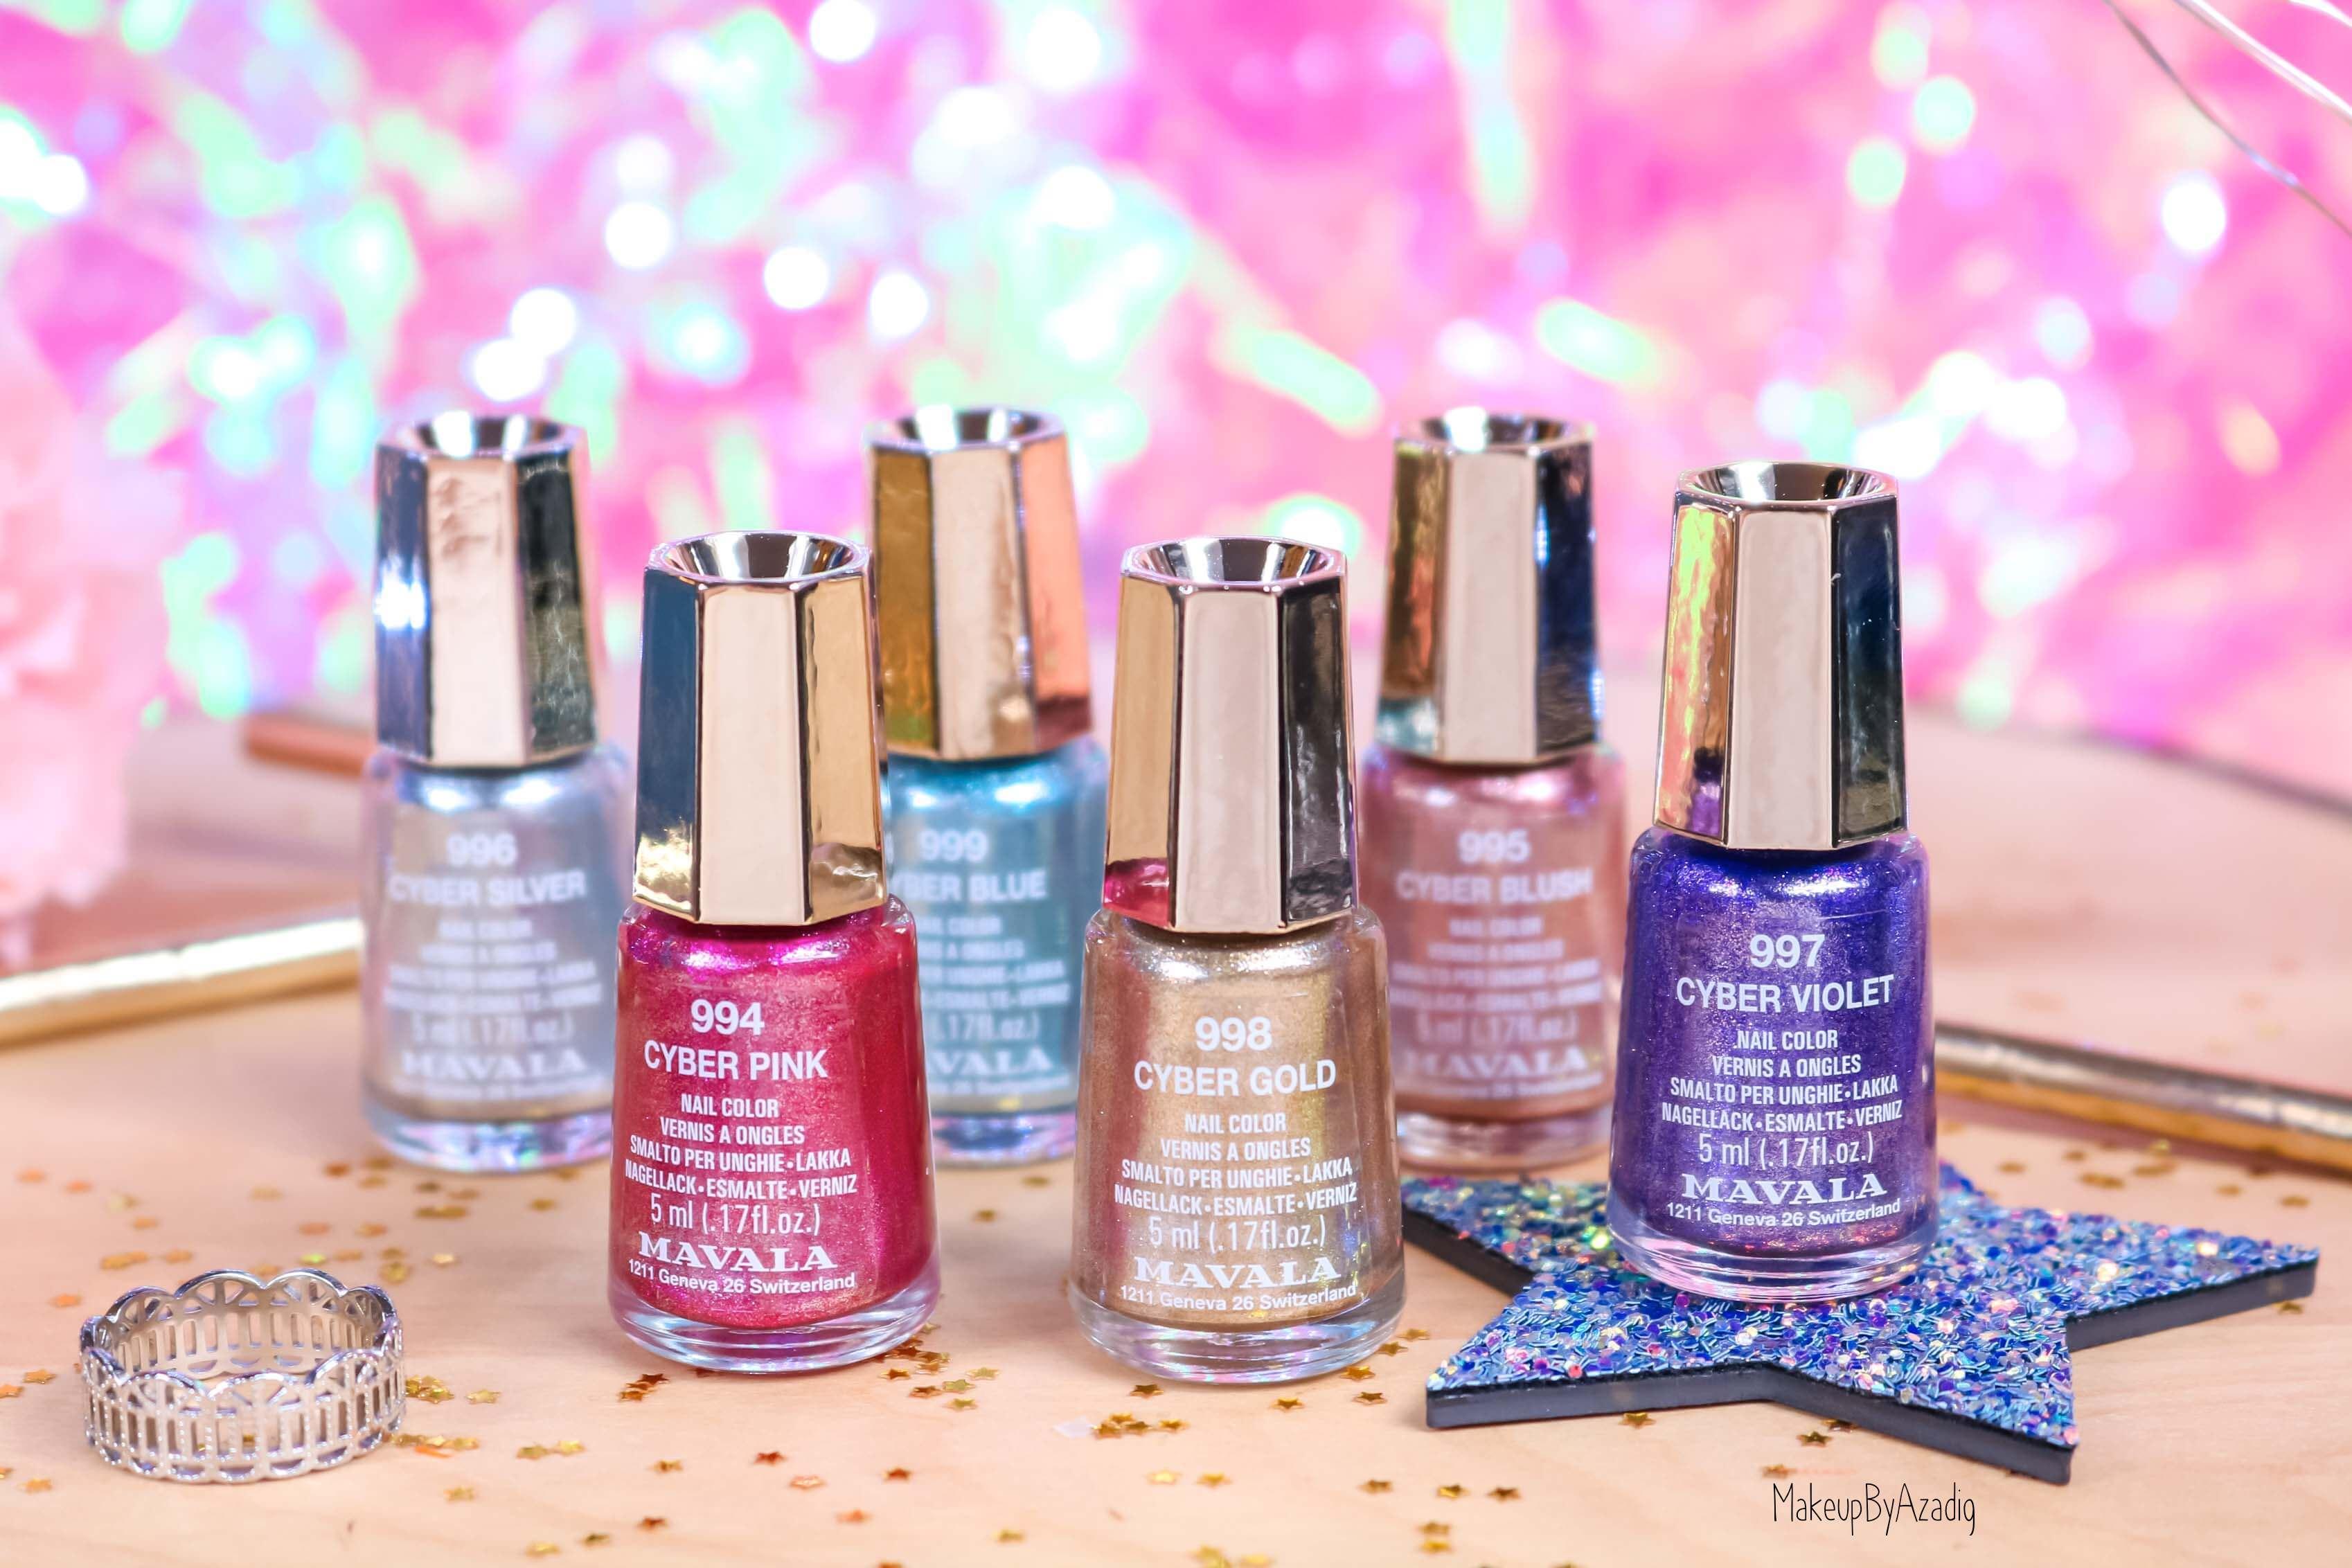 revue-collection-vernis-nails-cyber-chic-fetes-noel-metallique-gold-silver-makeupbyazadig-swatch-avis-prix-miniature